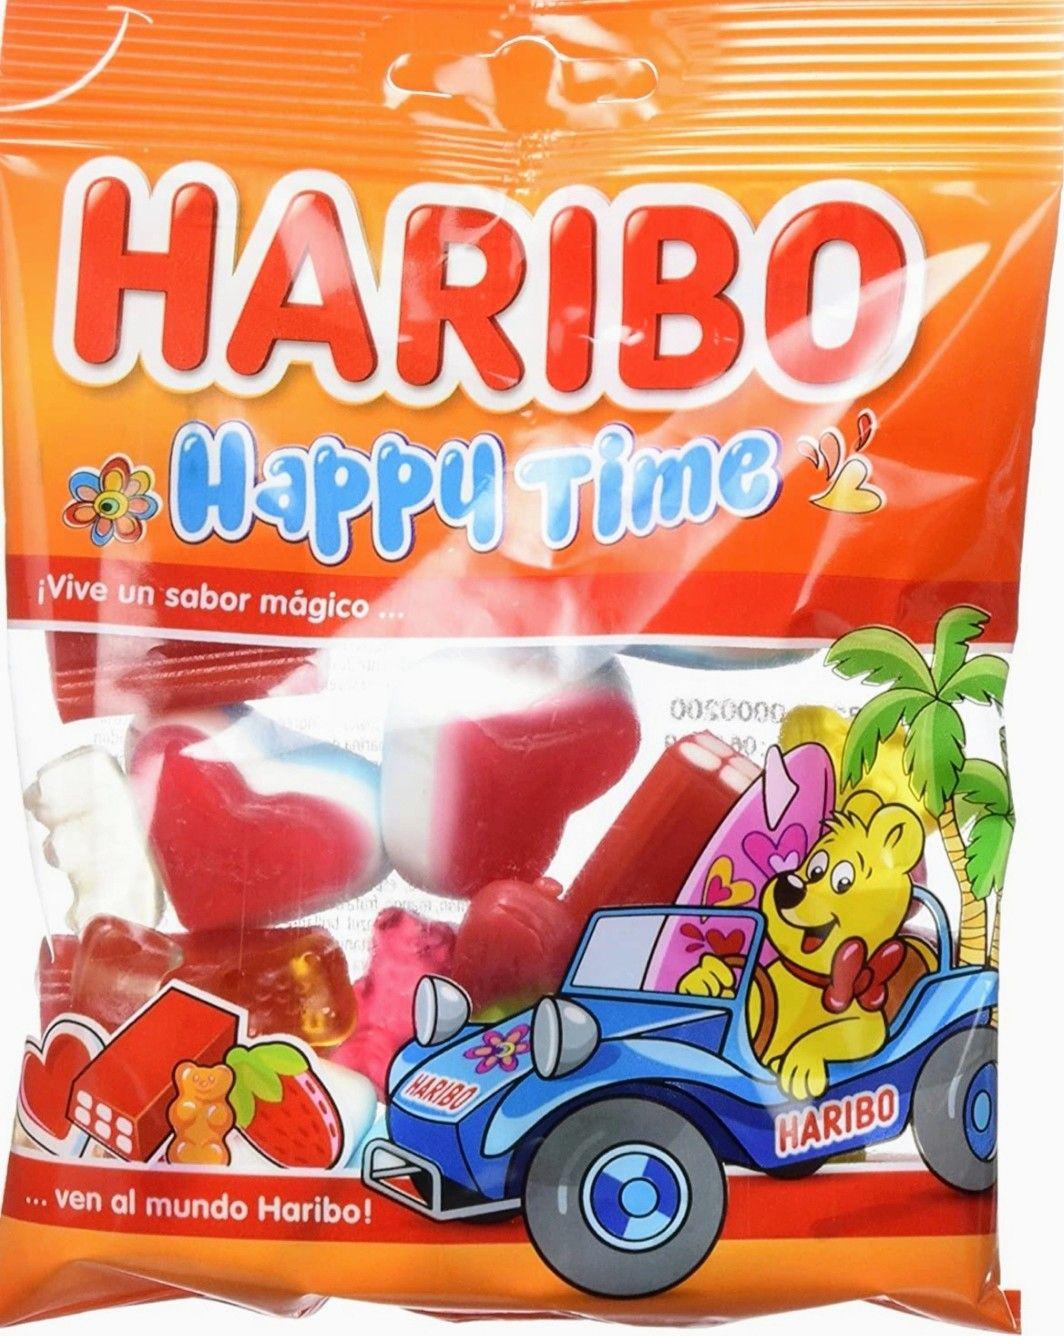 Haribo Happy Time. 18 bolsas x 90 gr. Total: 1620 gr (0.45 € bolsa,precio mínimo)